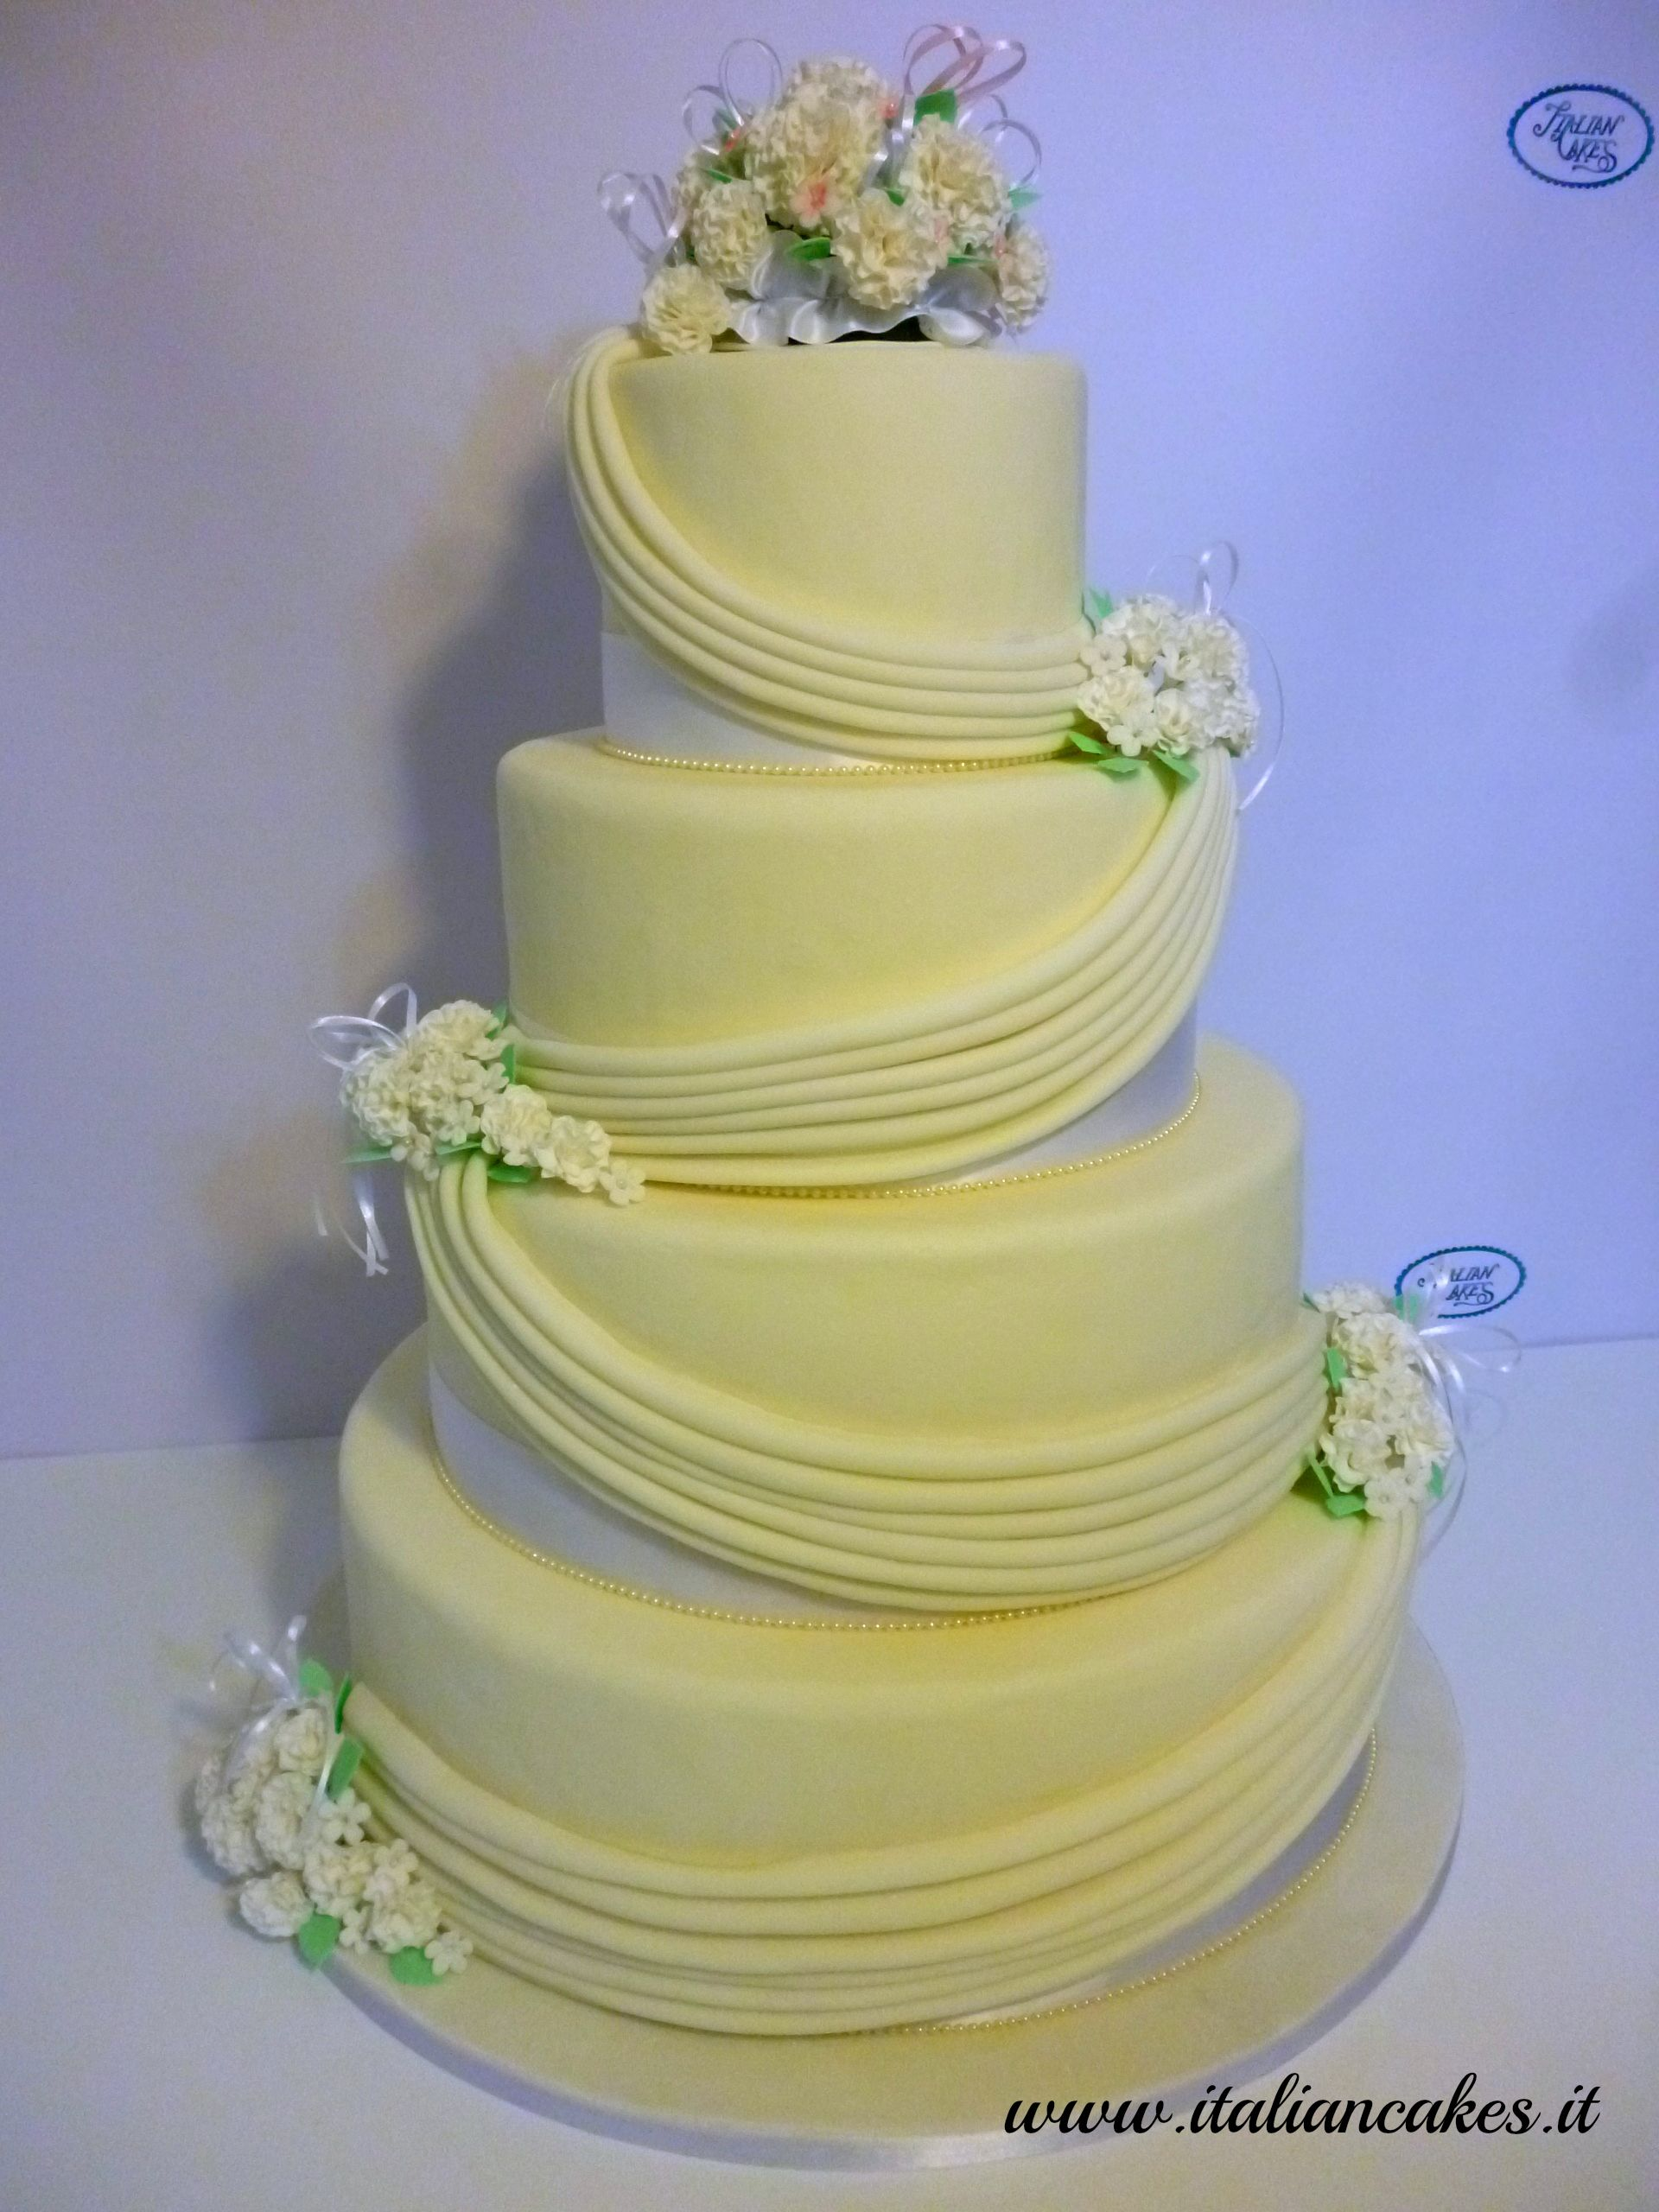 Round Wedding Cakes - Wedding cake with gumpaste flowers by ...